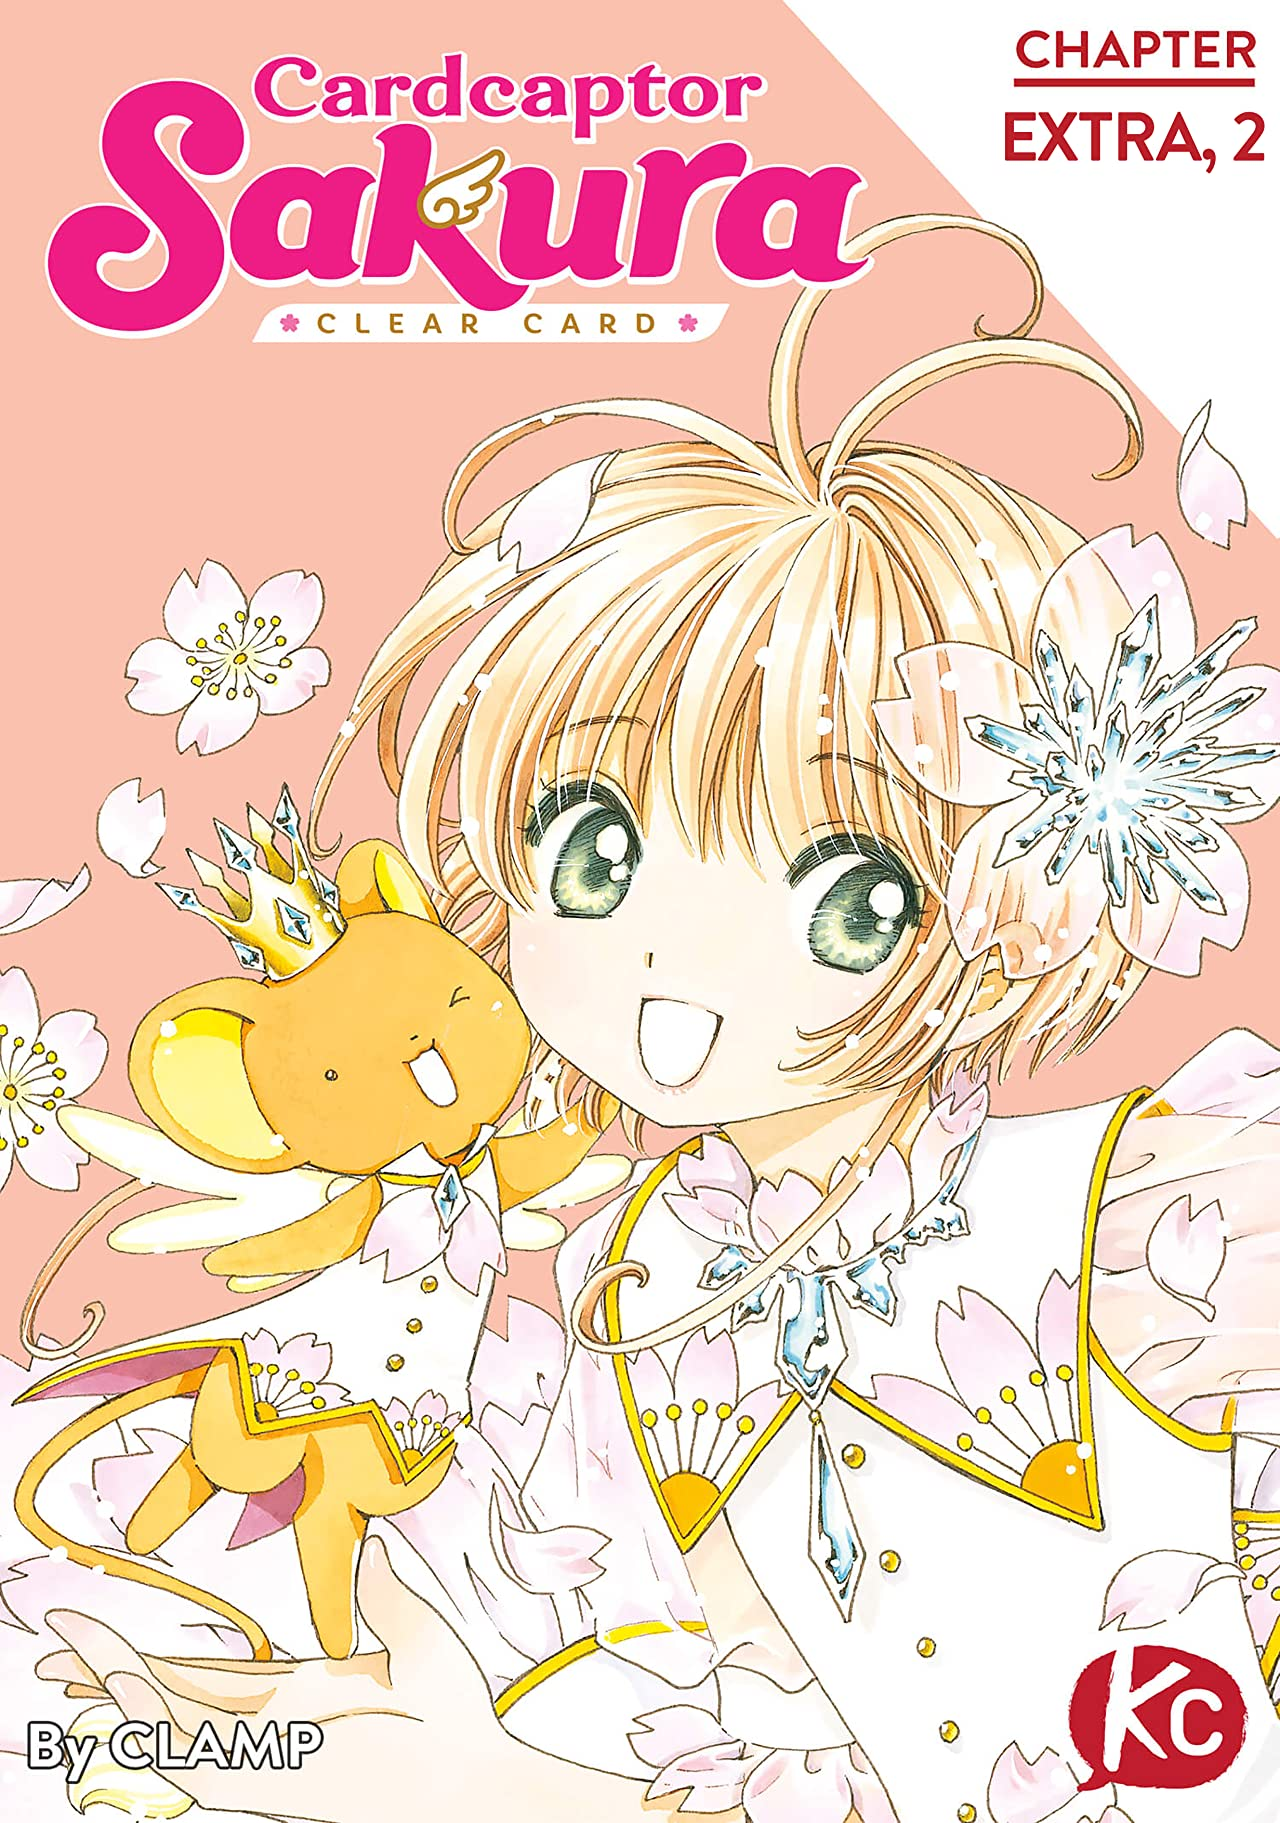 Cardcaptor Sakura: Clear Card No.Extra, 2